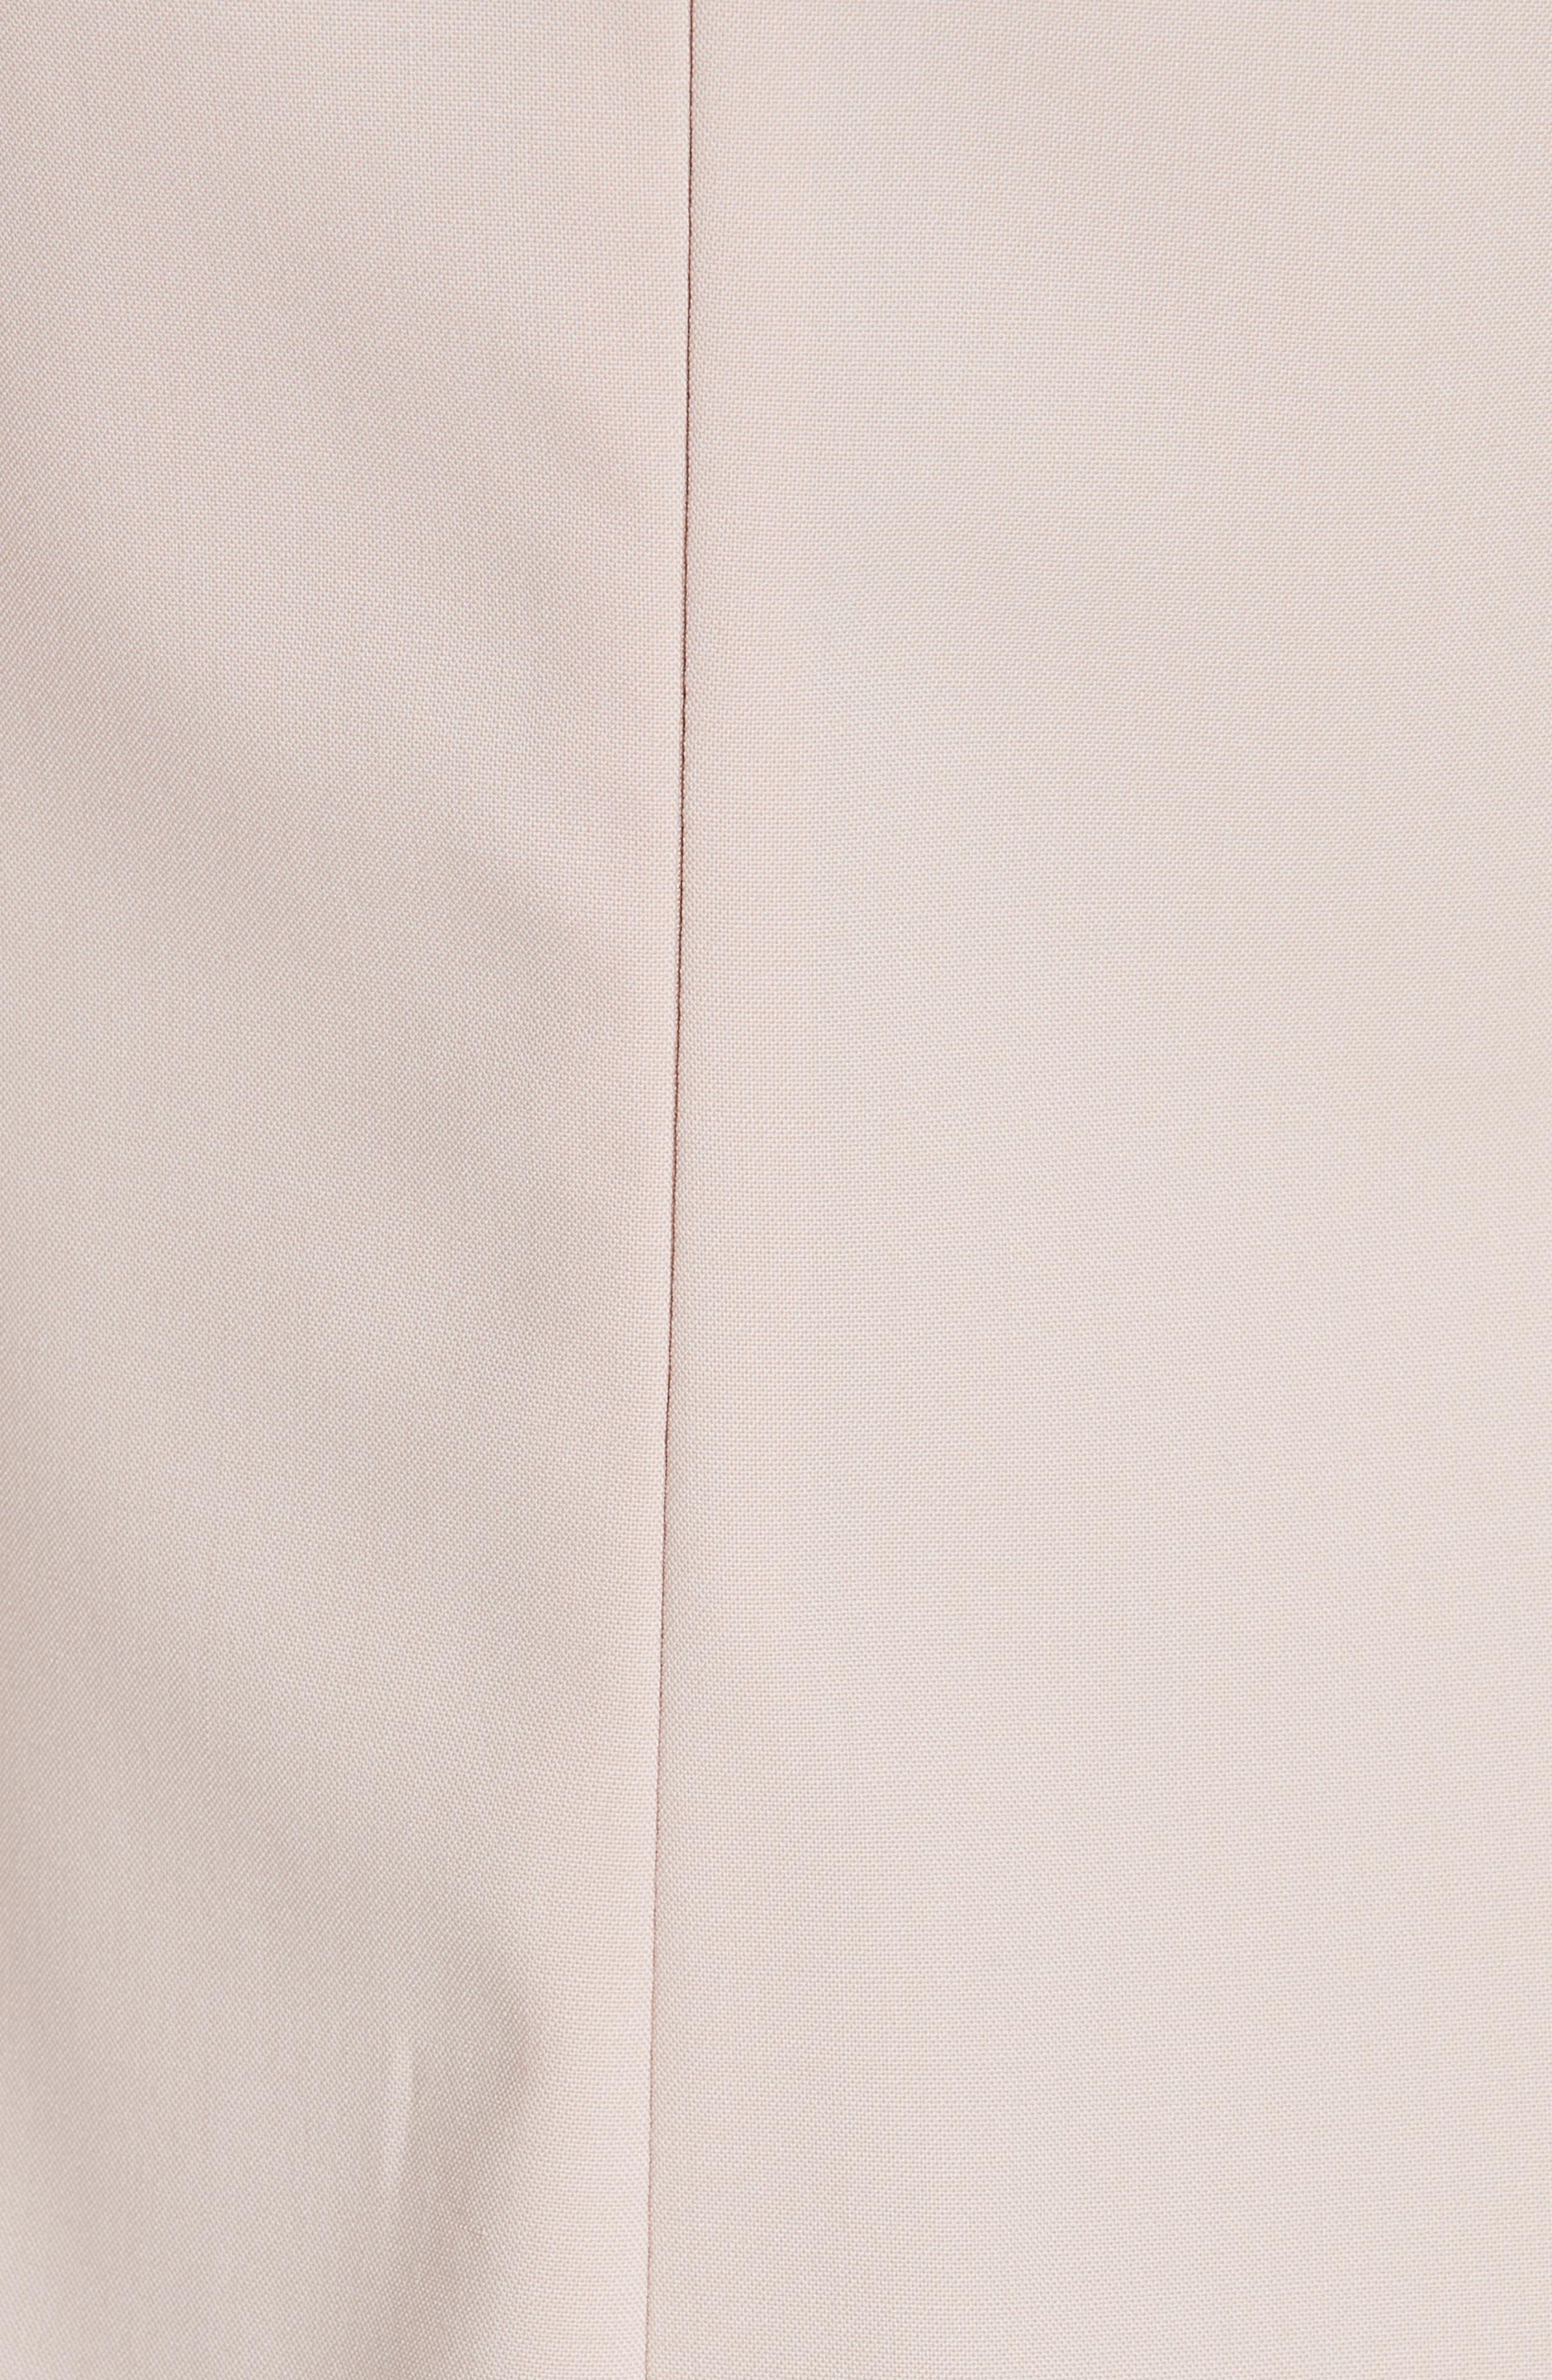 Eano Good Wool Sheath Dress,                             Alternate thumbnail 5, color,                             650